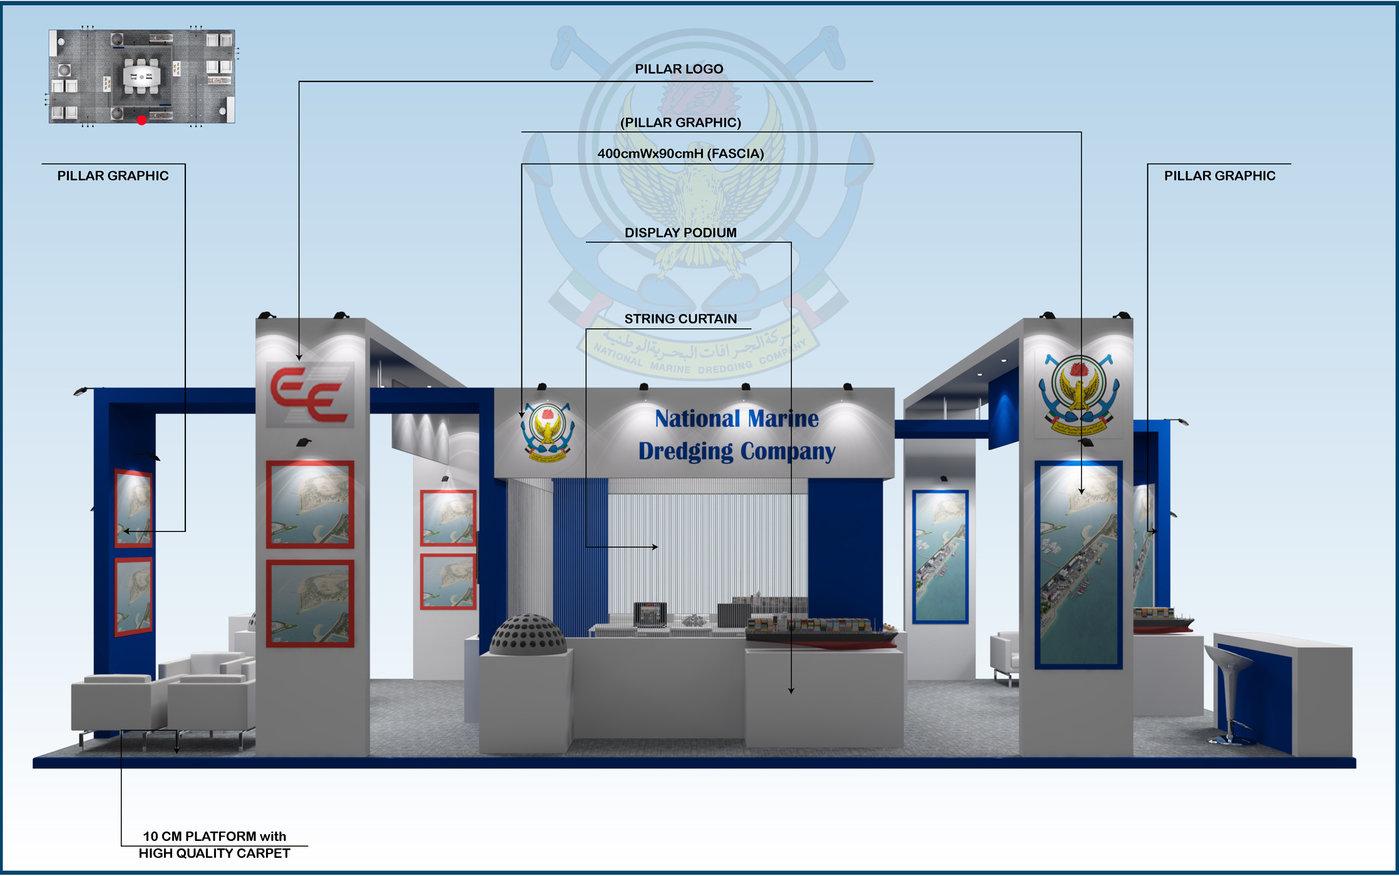 National Marine Dredging Company by Mamerto Dela Cruz Jr at